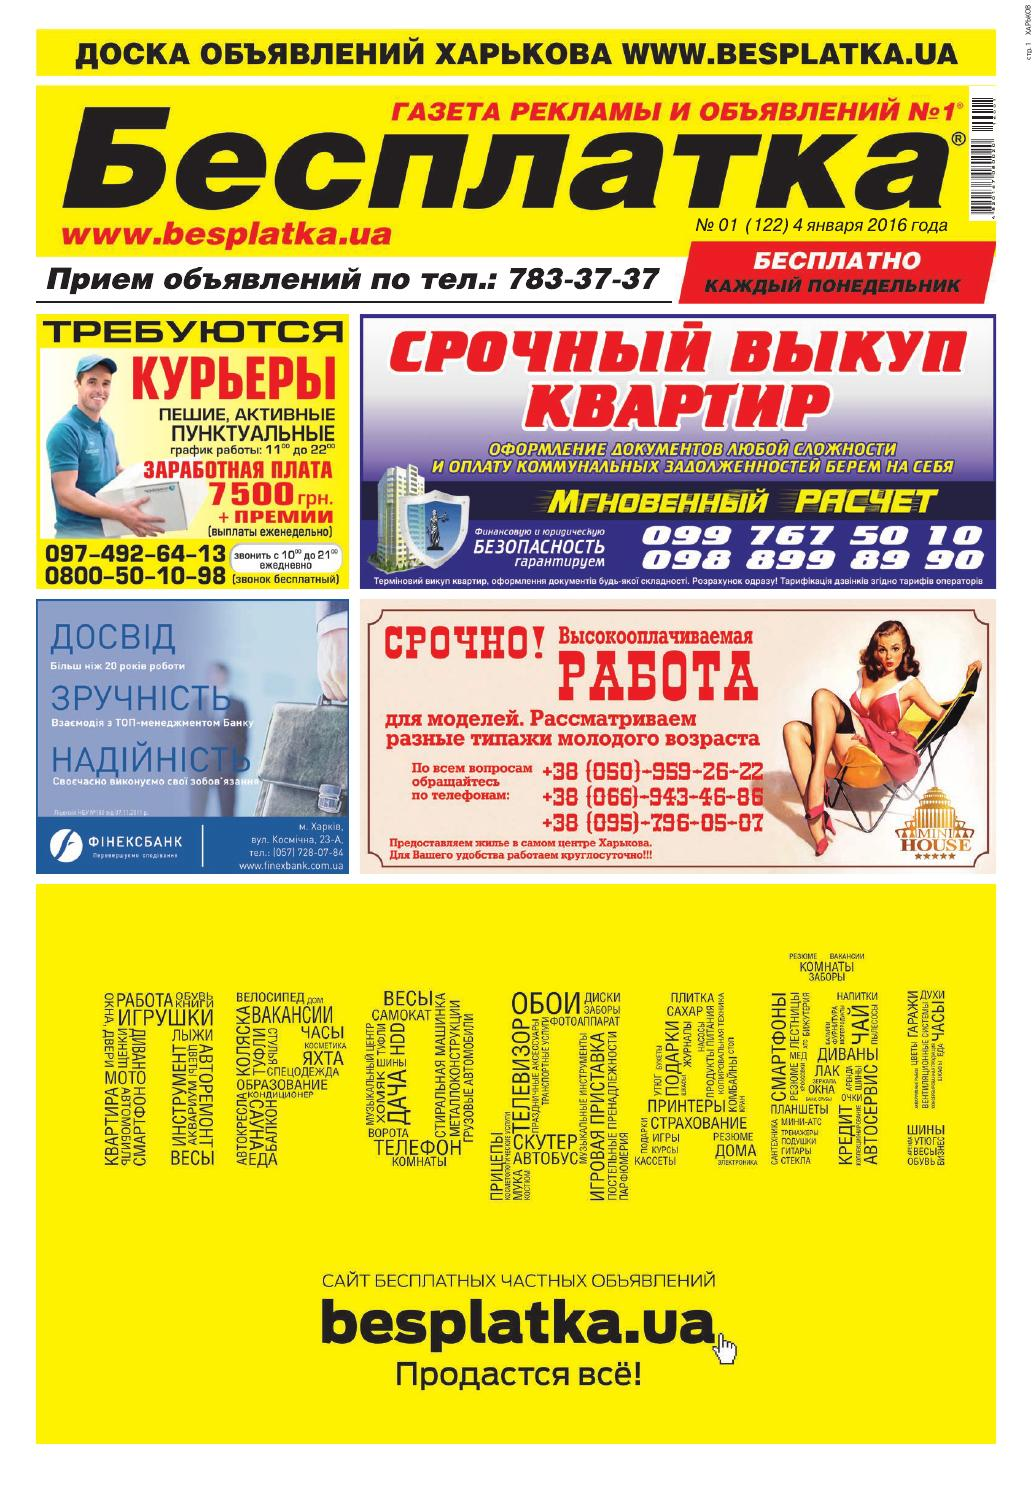 09ed996b Besplatka #1 Харьков by besplatka ukraine - issuu